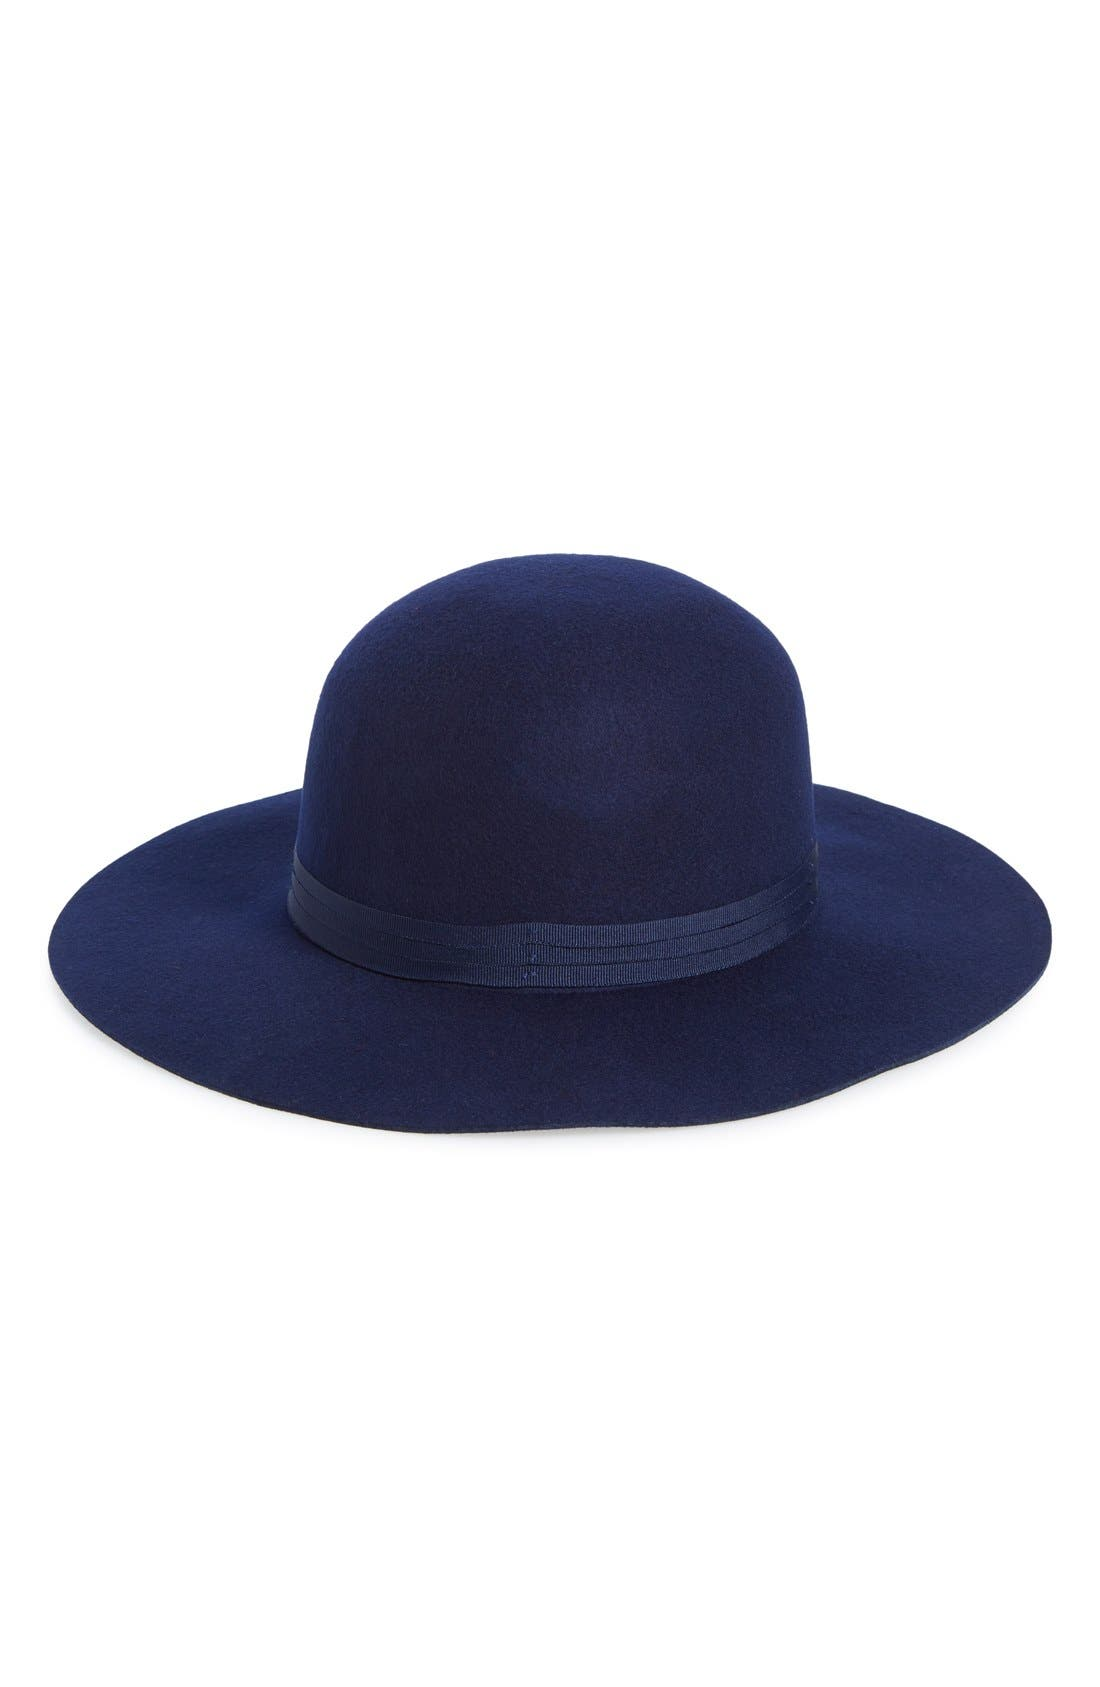 'Magdalena' Wide Brim Wool Felt Hat,                         Main,                         color, Navy